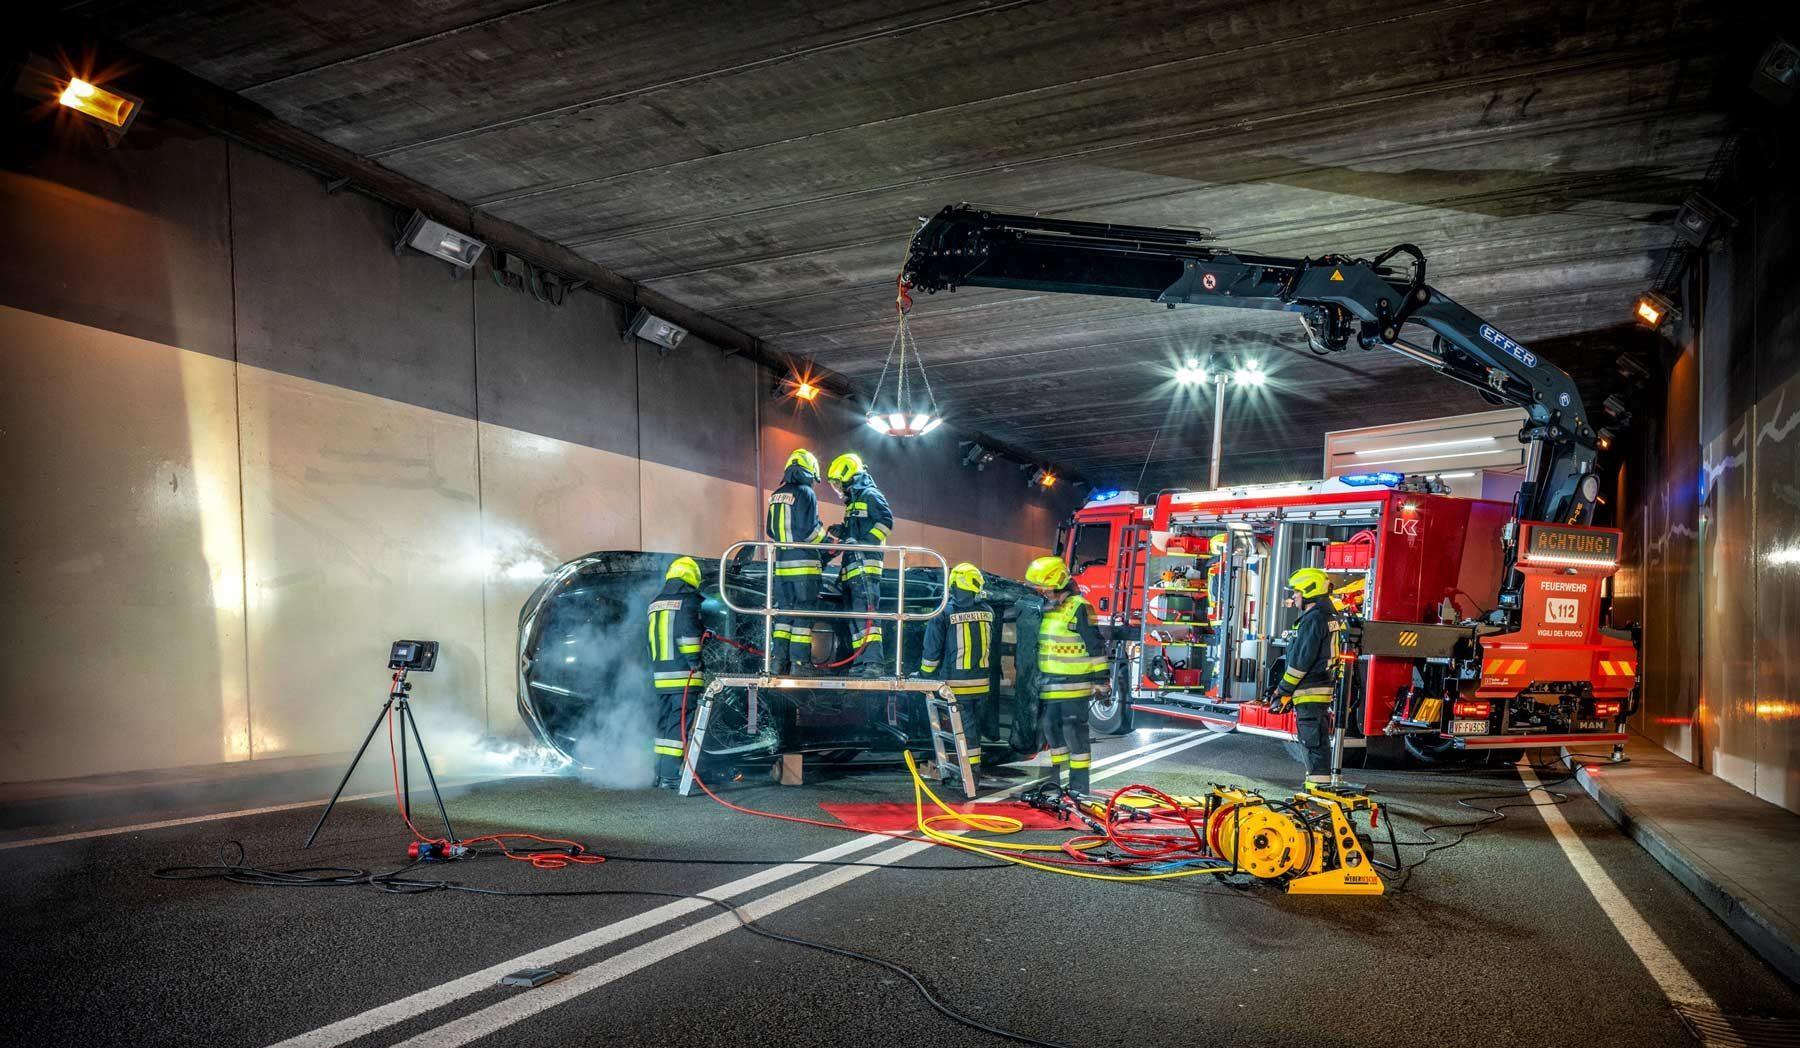 Kofler Fahrzeugbau SRF Schweres Rüstfahrzeug FF. St. Michael Eppan